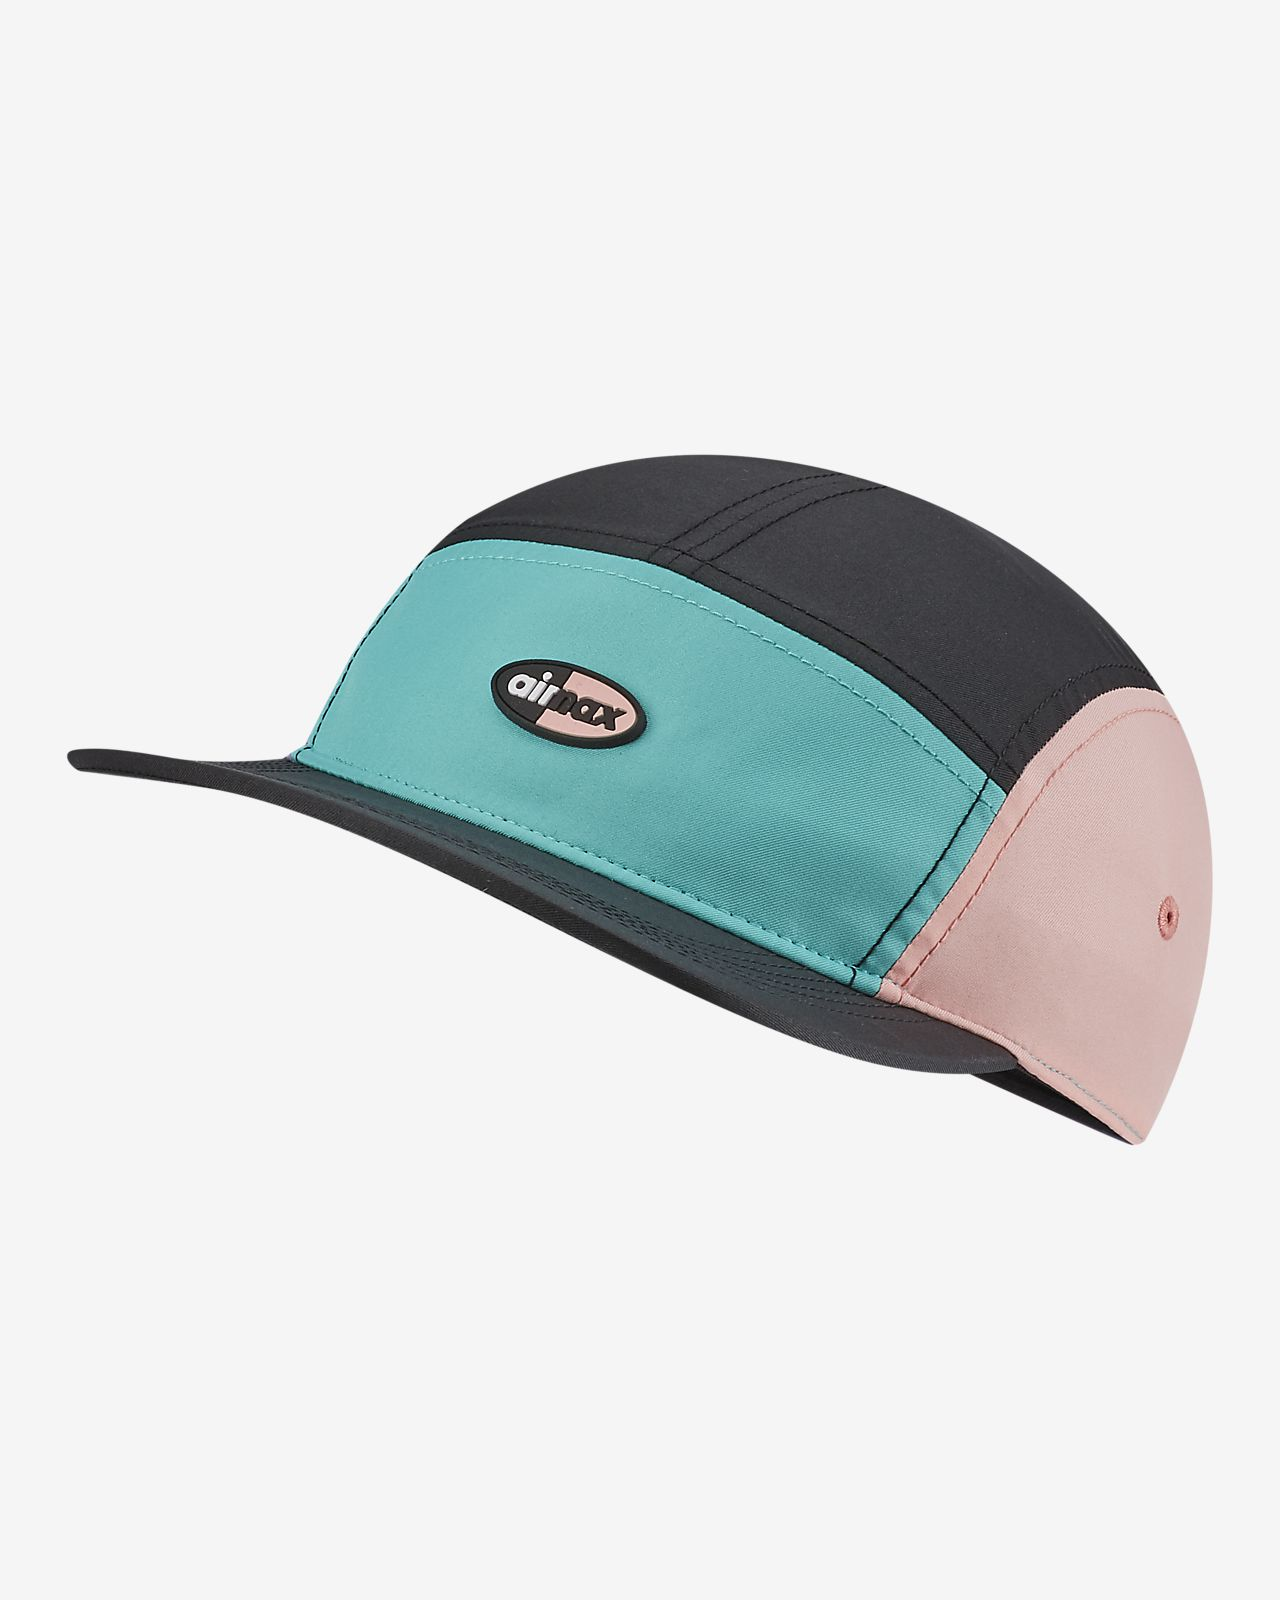 a55f81e54c8 Nike Sportswear AW84 Adjustable Hat. Nike.com